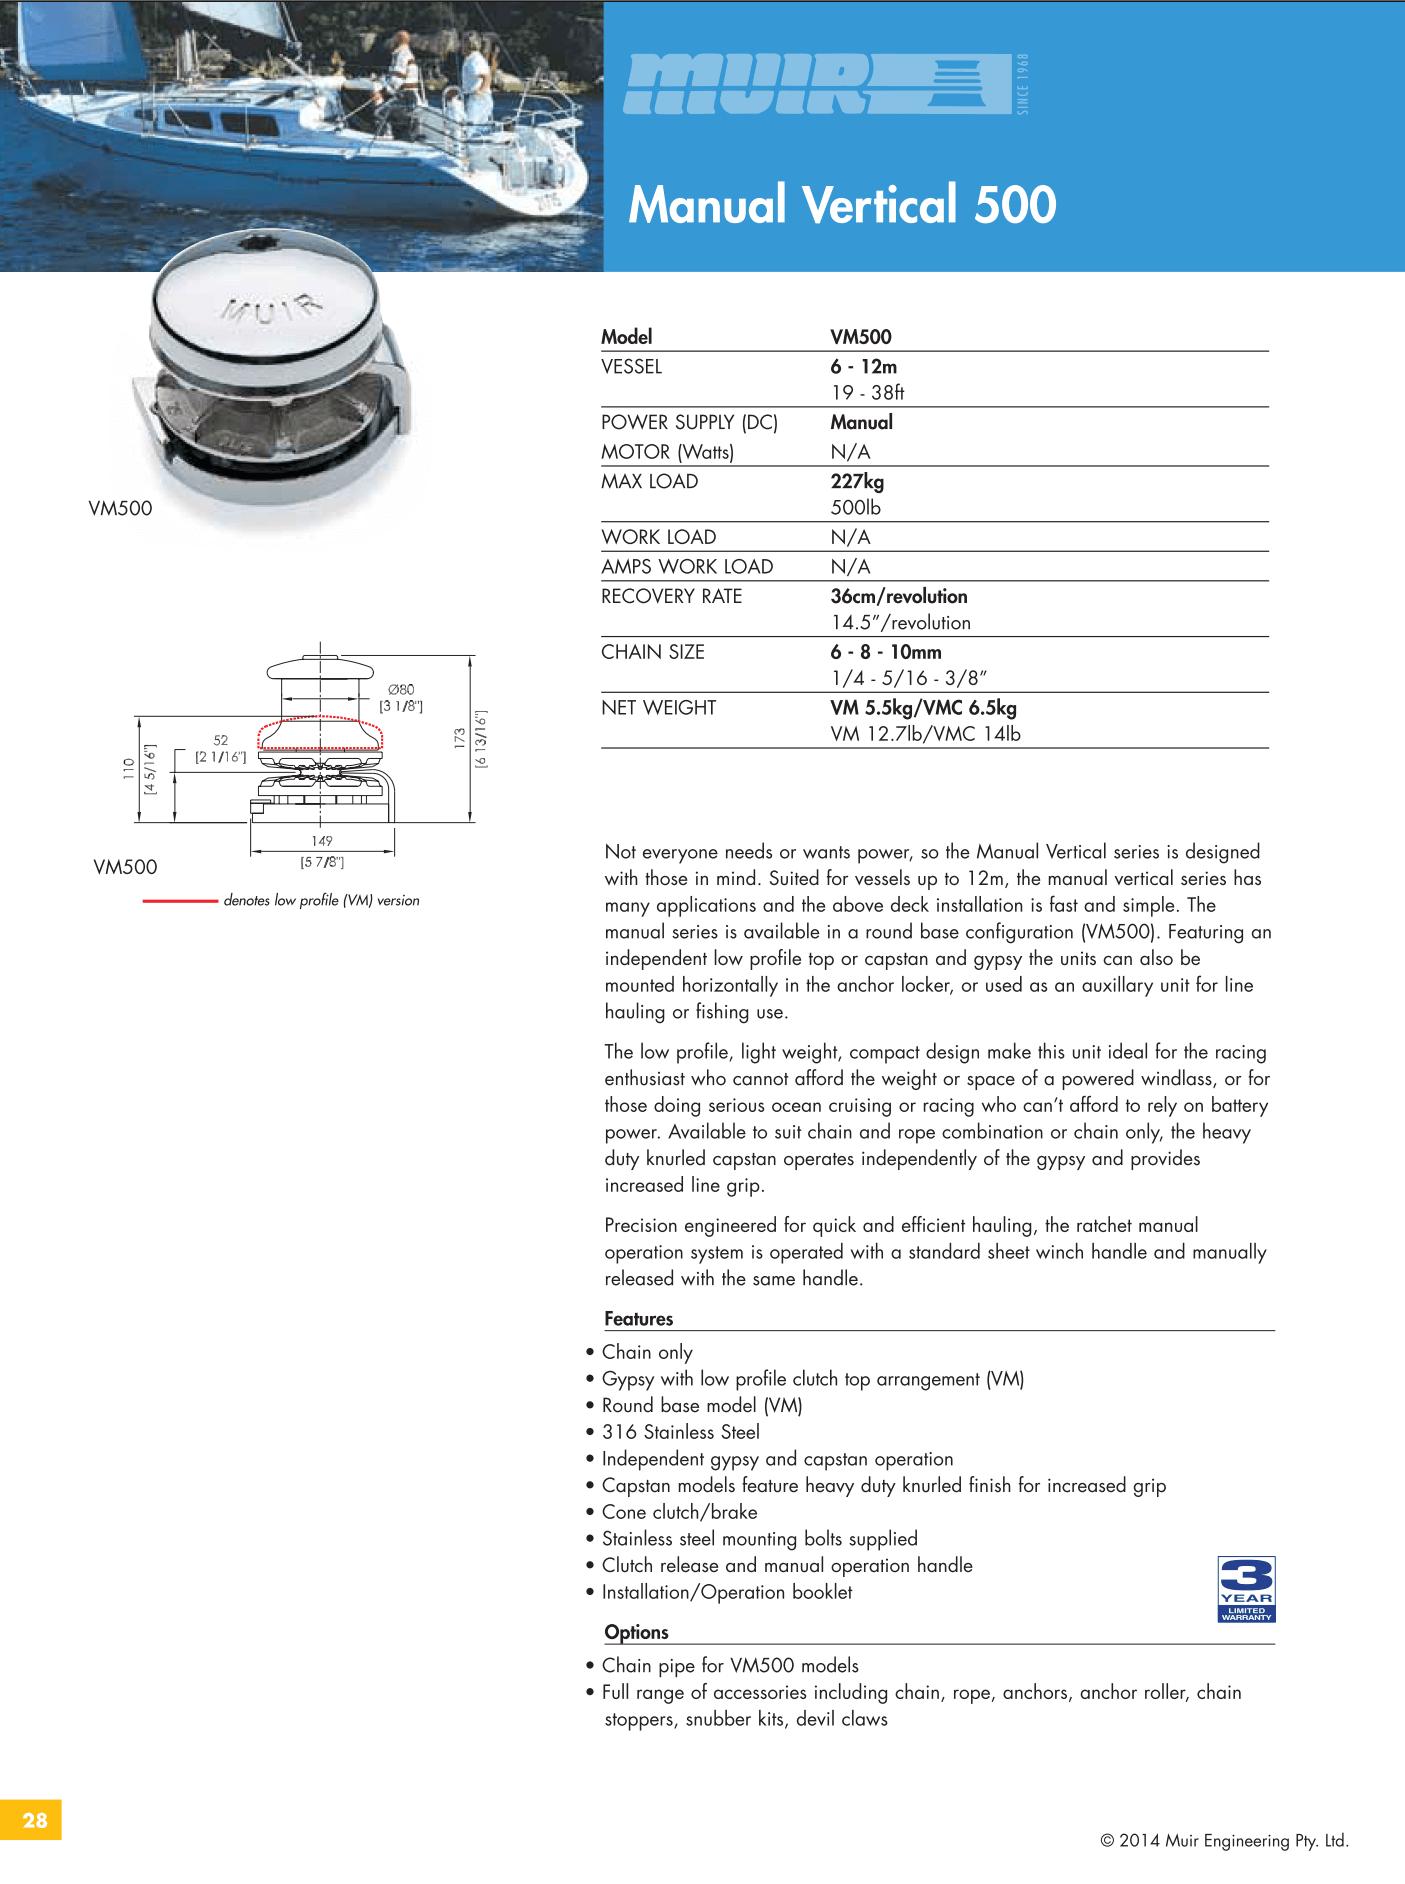 Datenblatt MUIR VM500 Manuelle Handankerwinde, vertikal